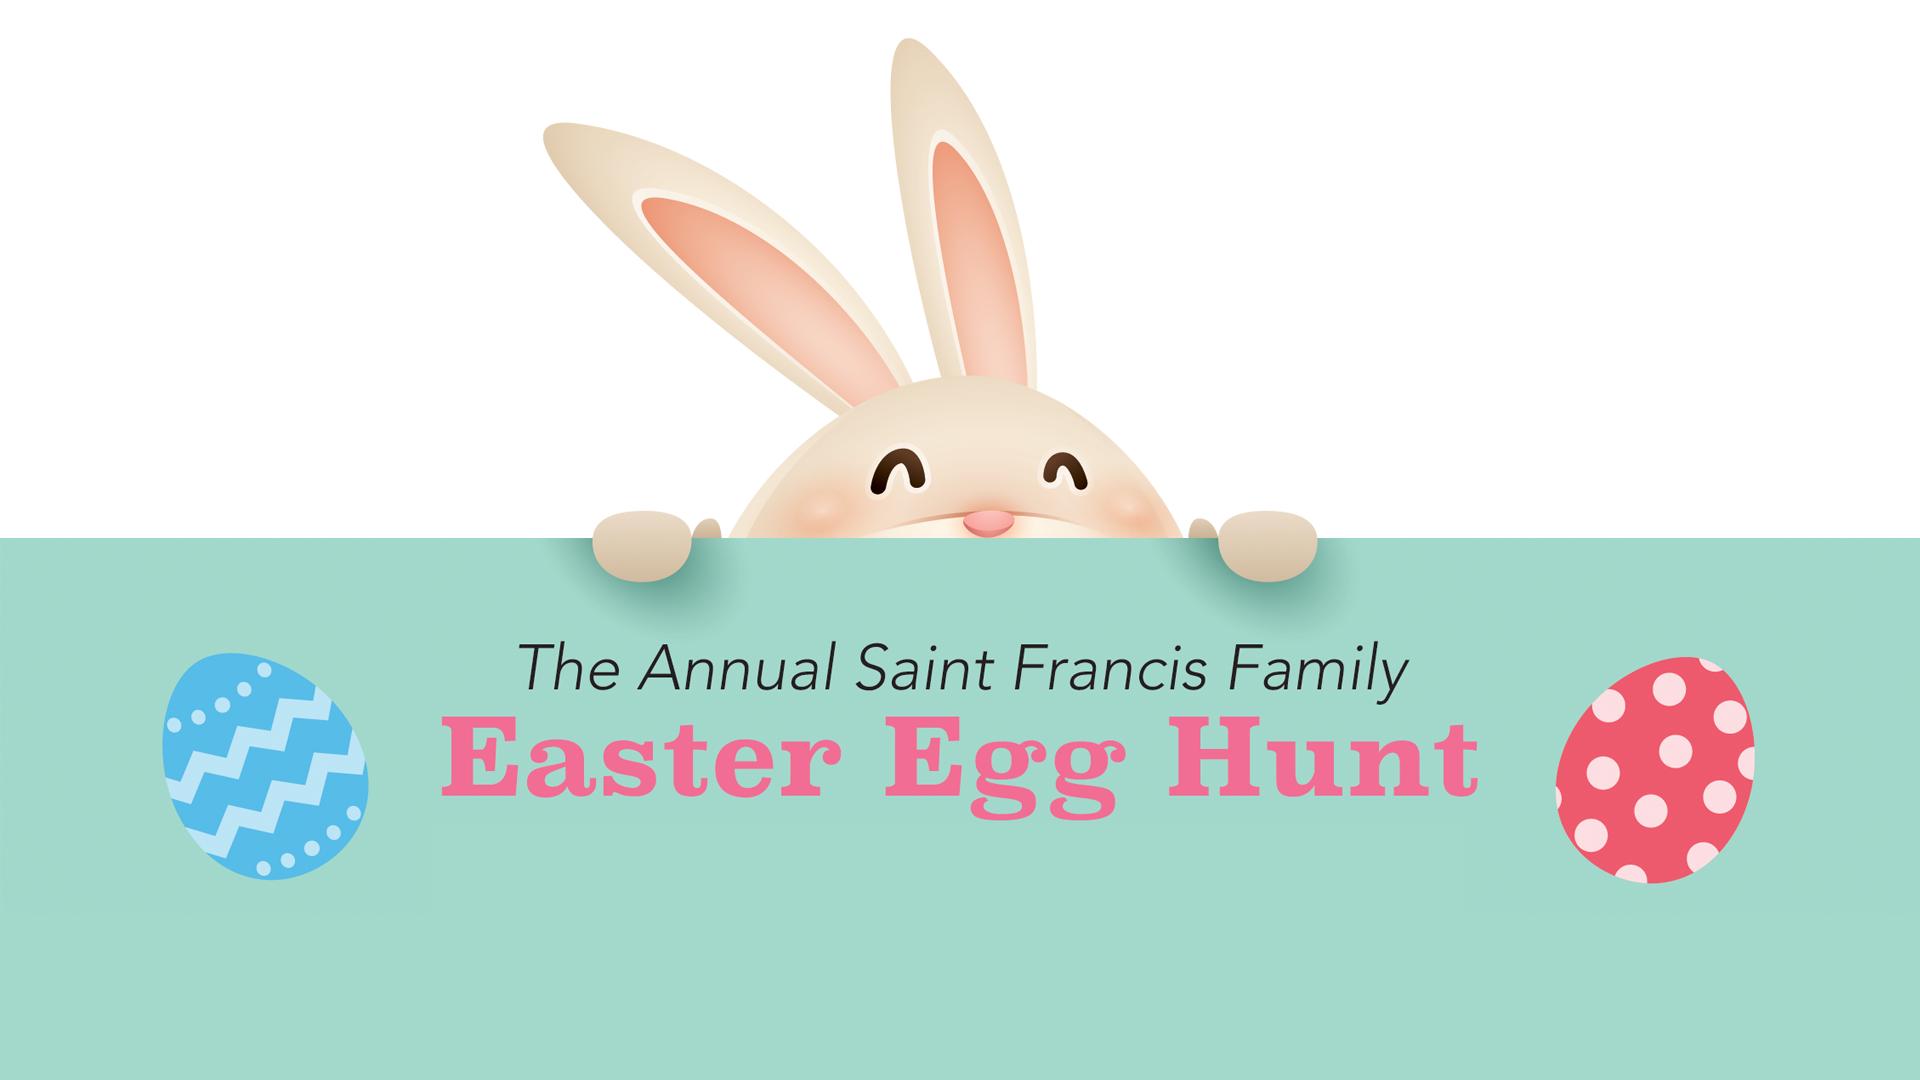 Saint Francis Family Easter Egg Hunt 2018   24 MAR 2018 1920x1080